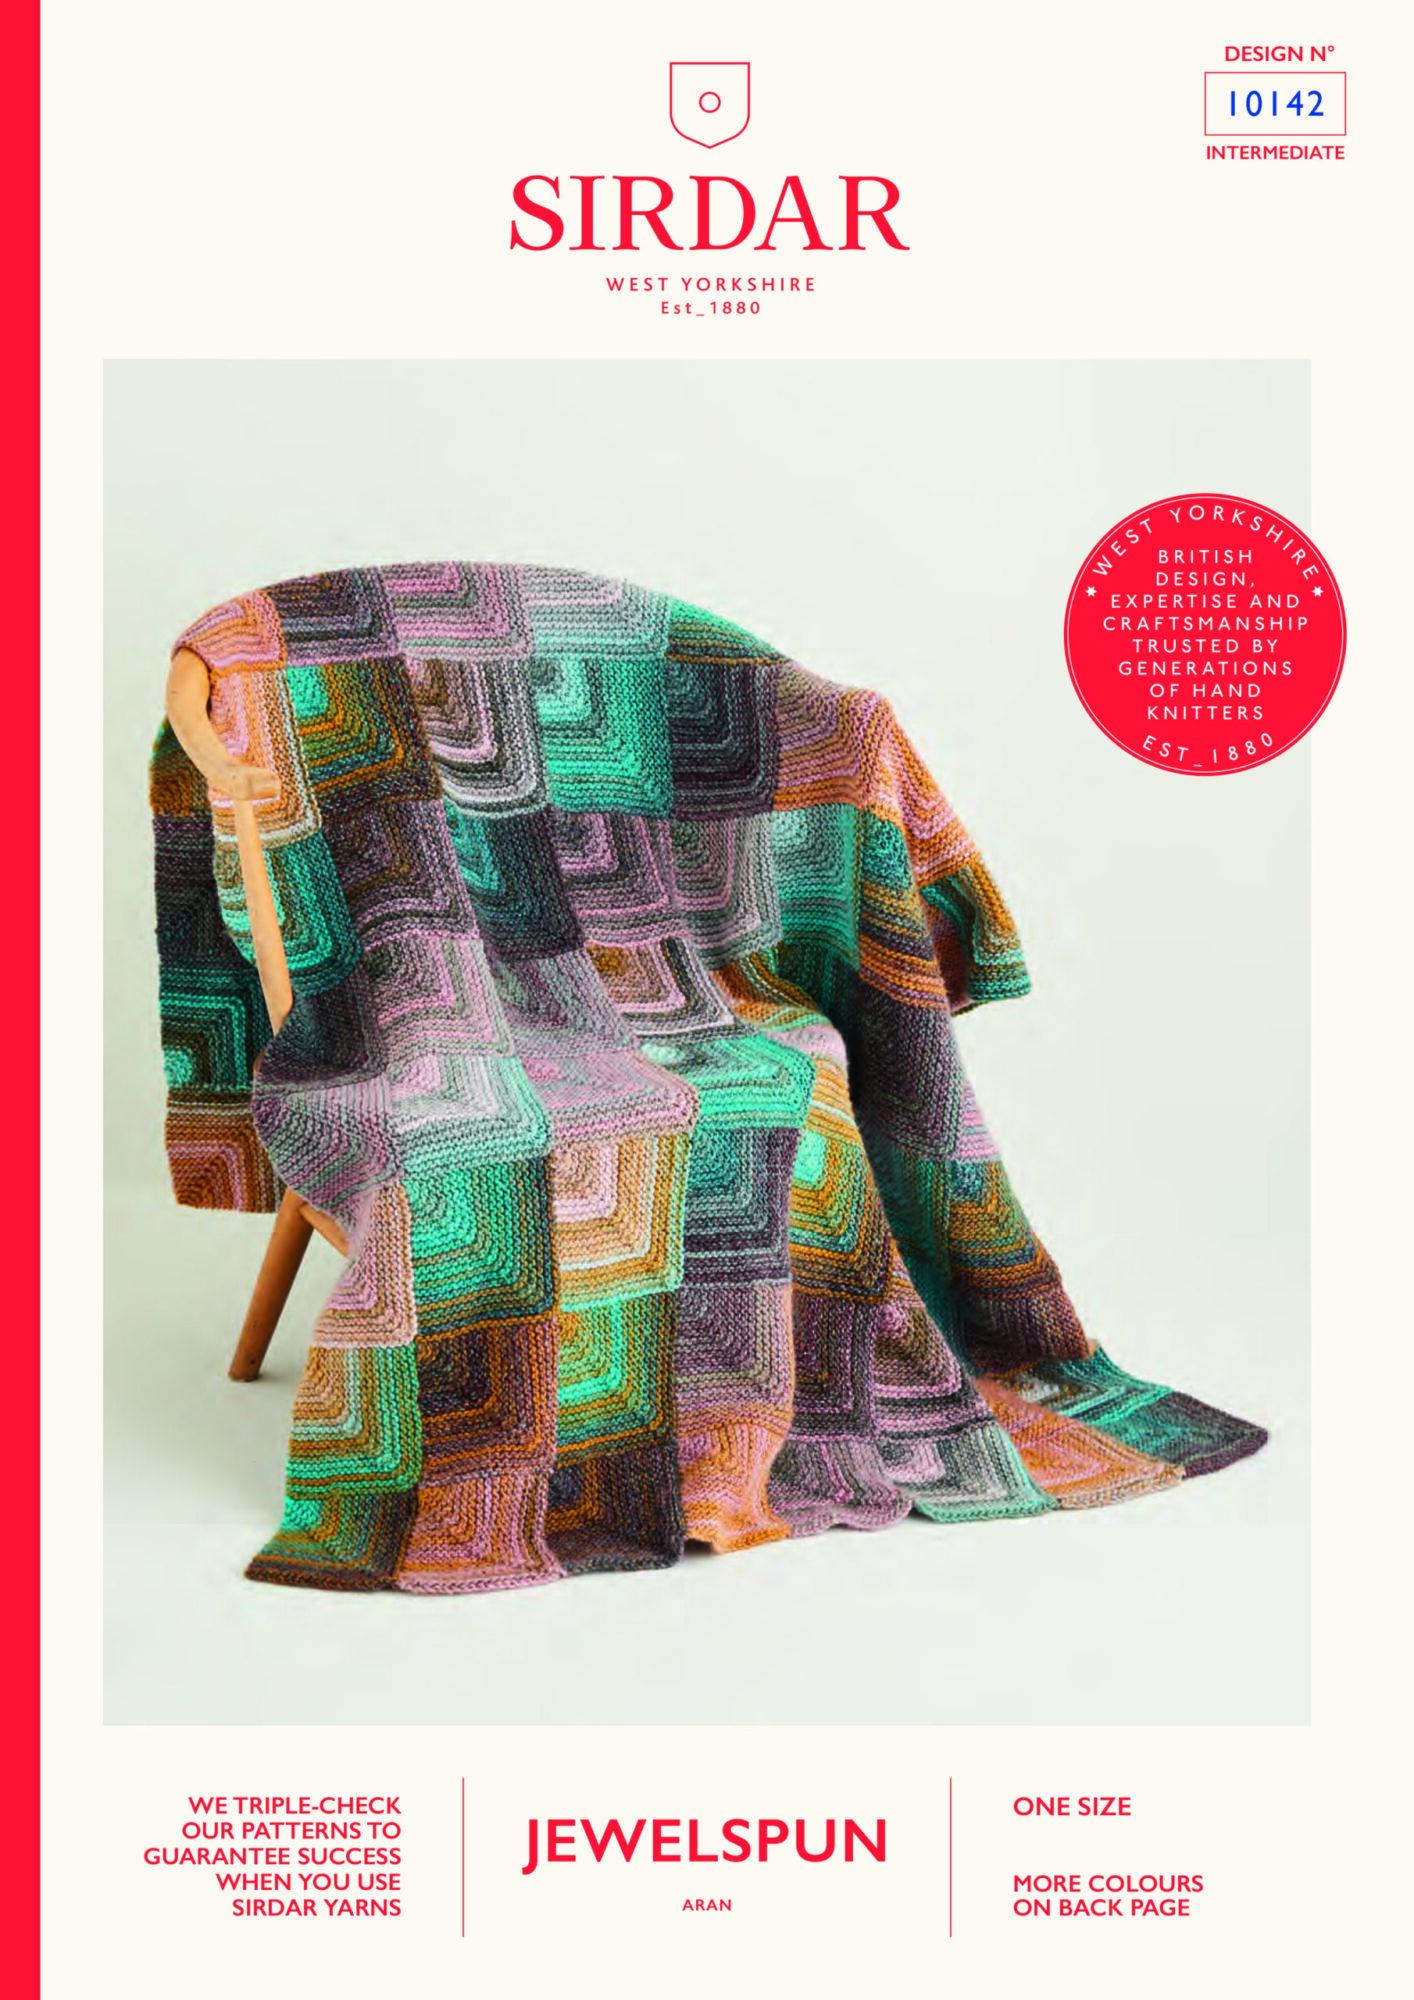 Sirdar Pattern Jewelspun  10142 (Download) product image